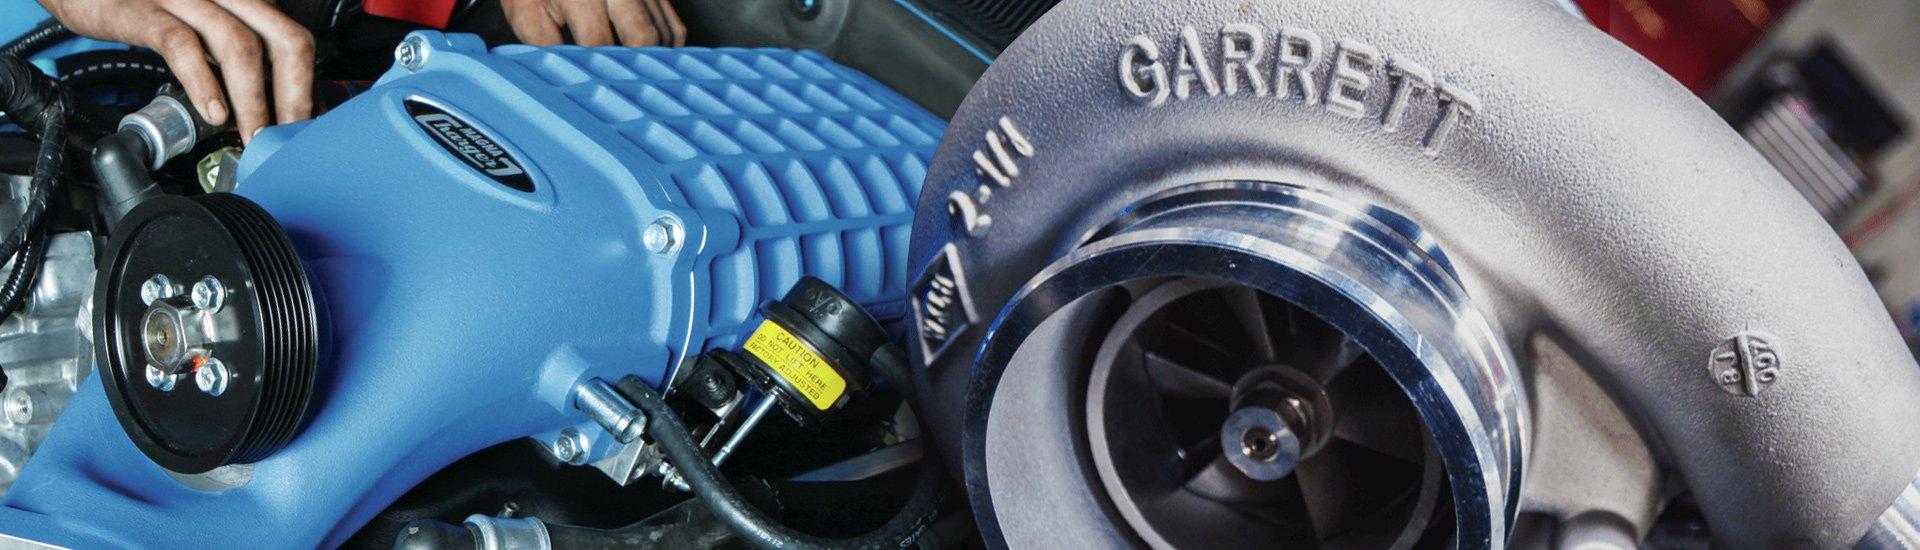 tregf turbosprężarka